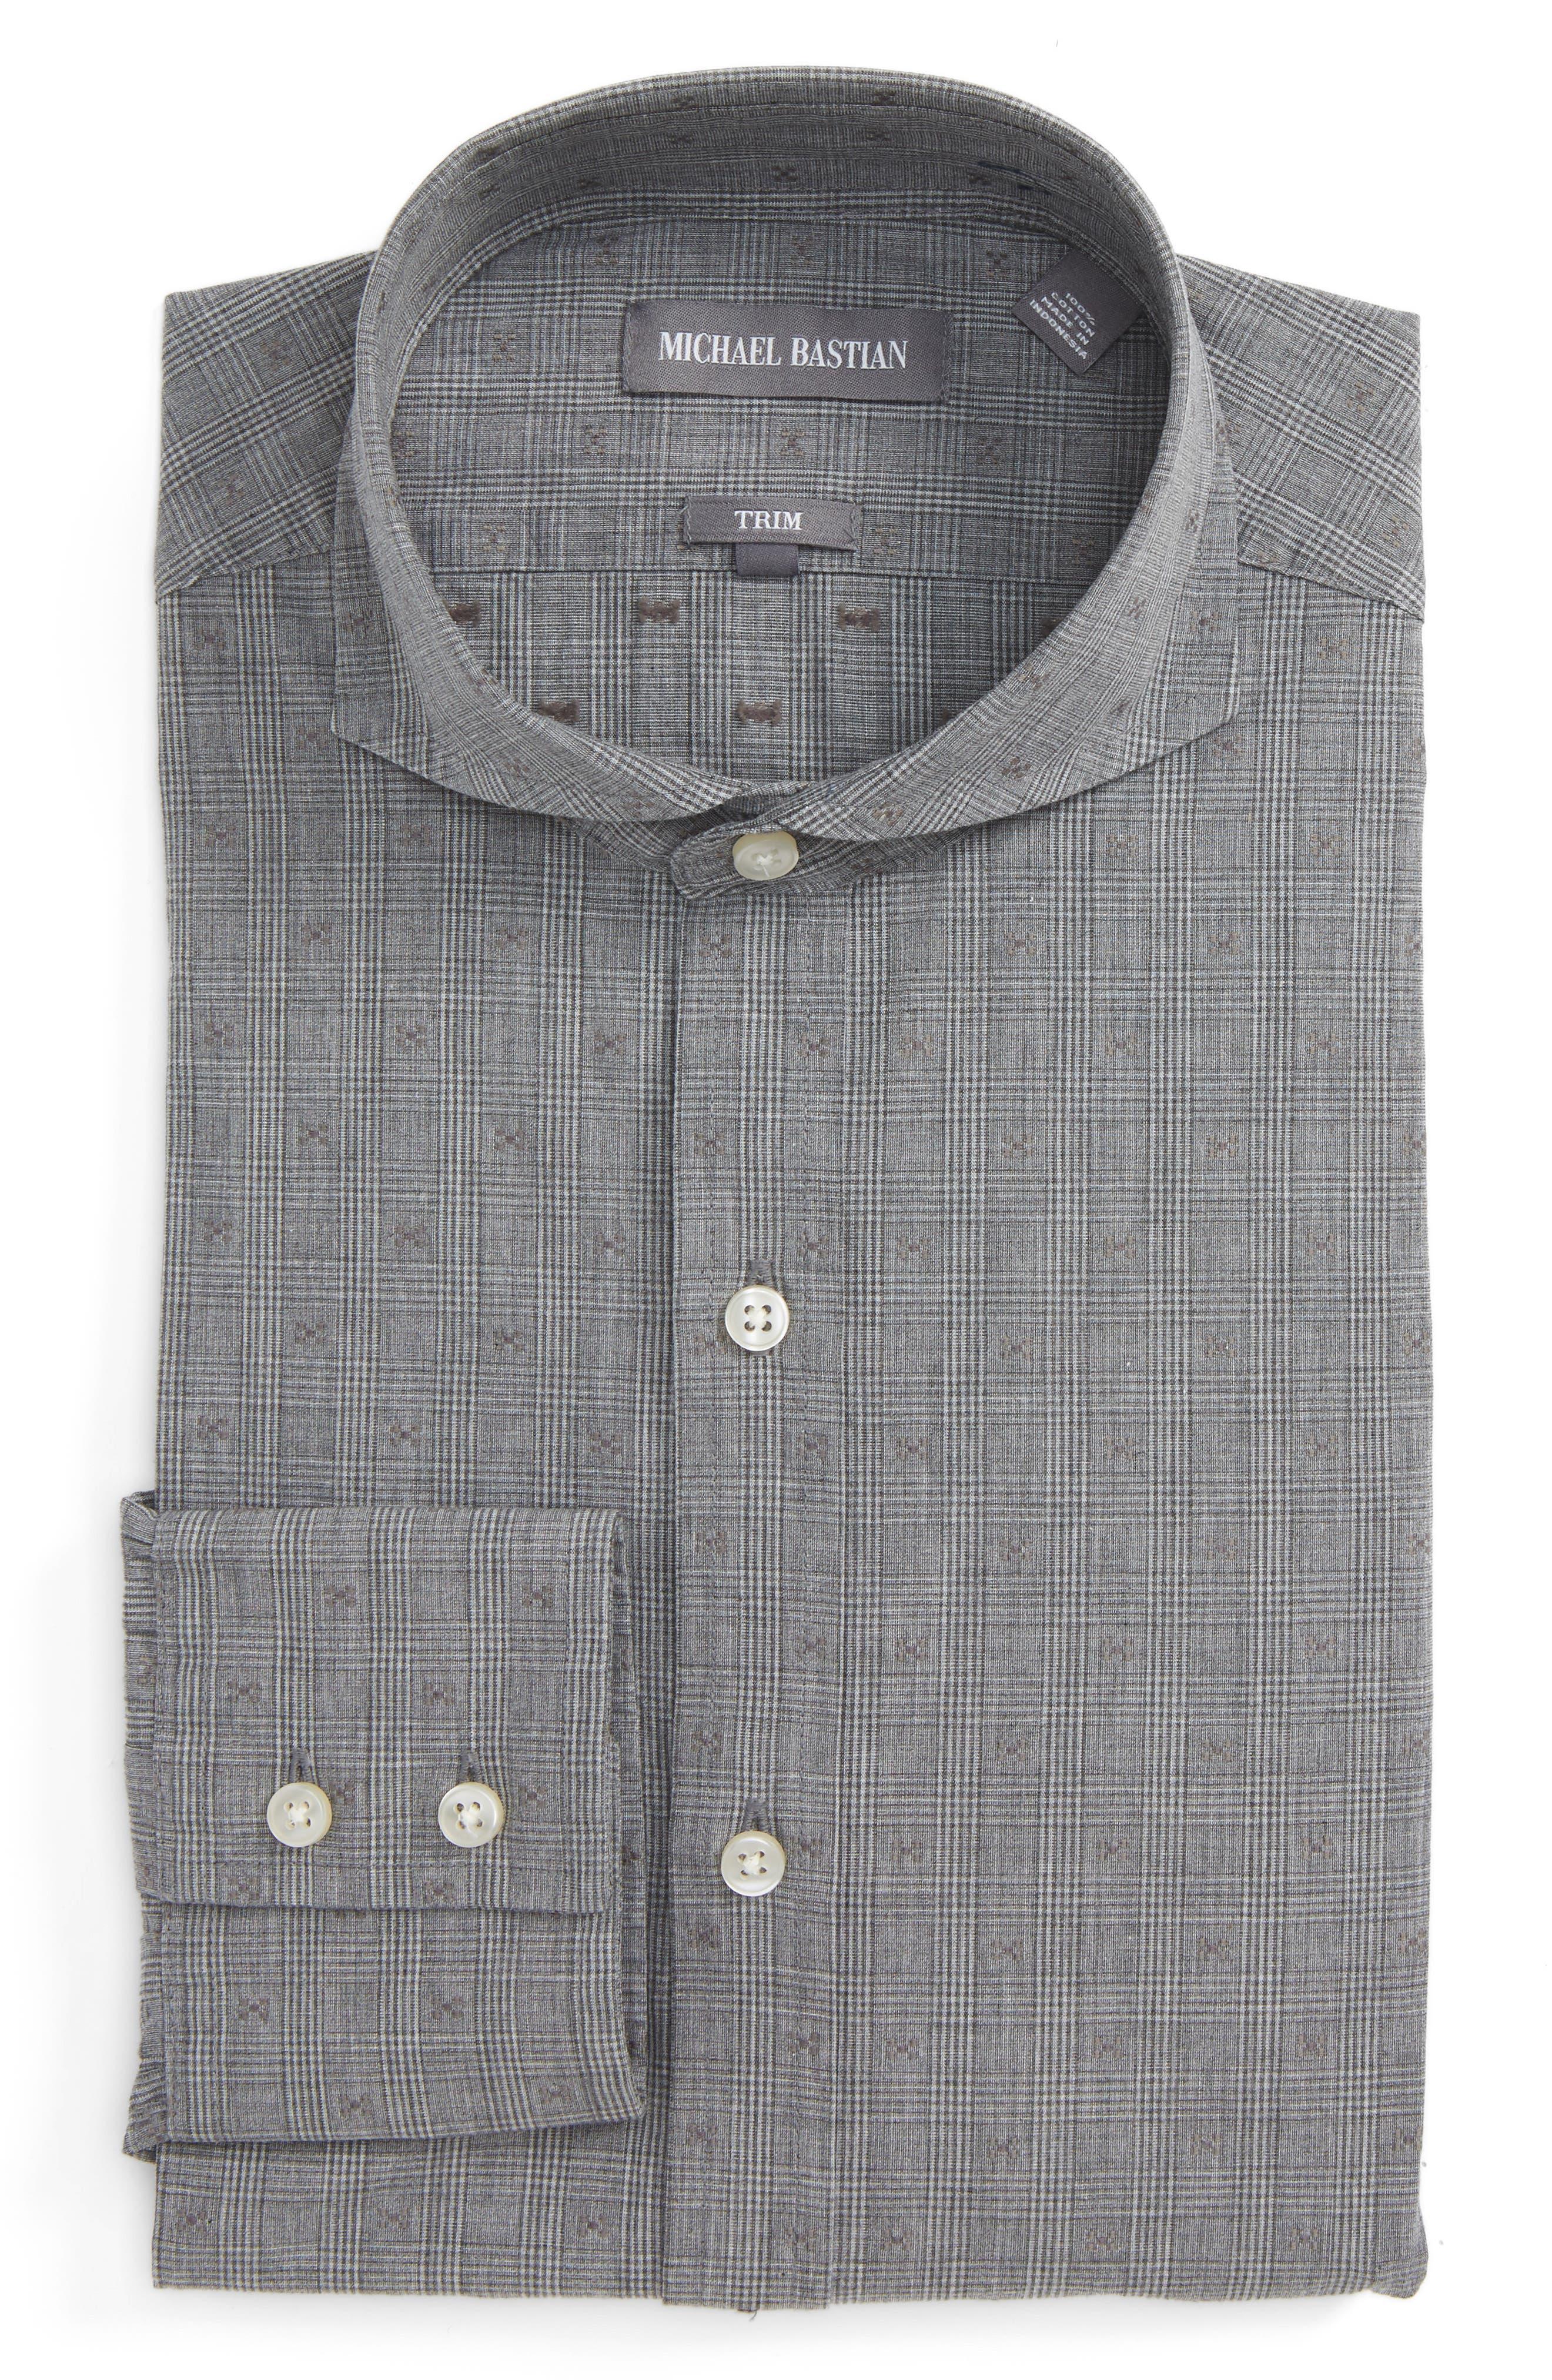 Michael Bastian Trim Fit Glenn Plaid Dress Shirt